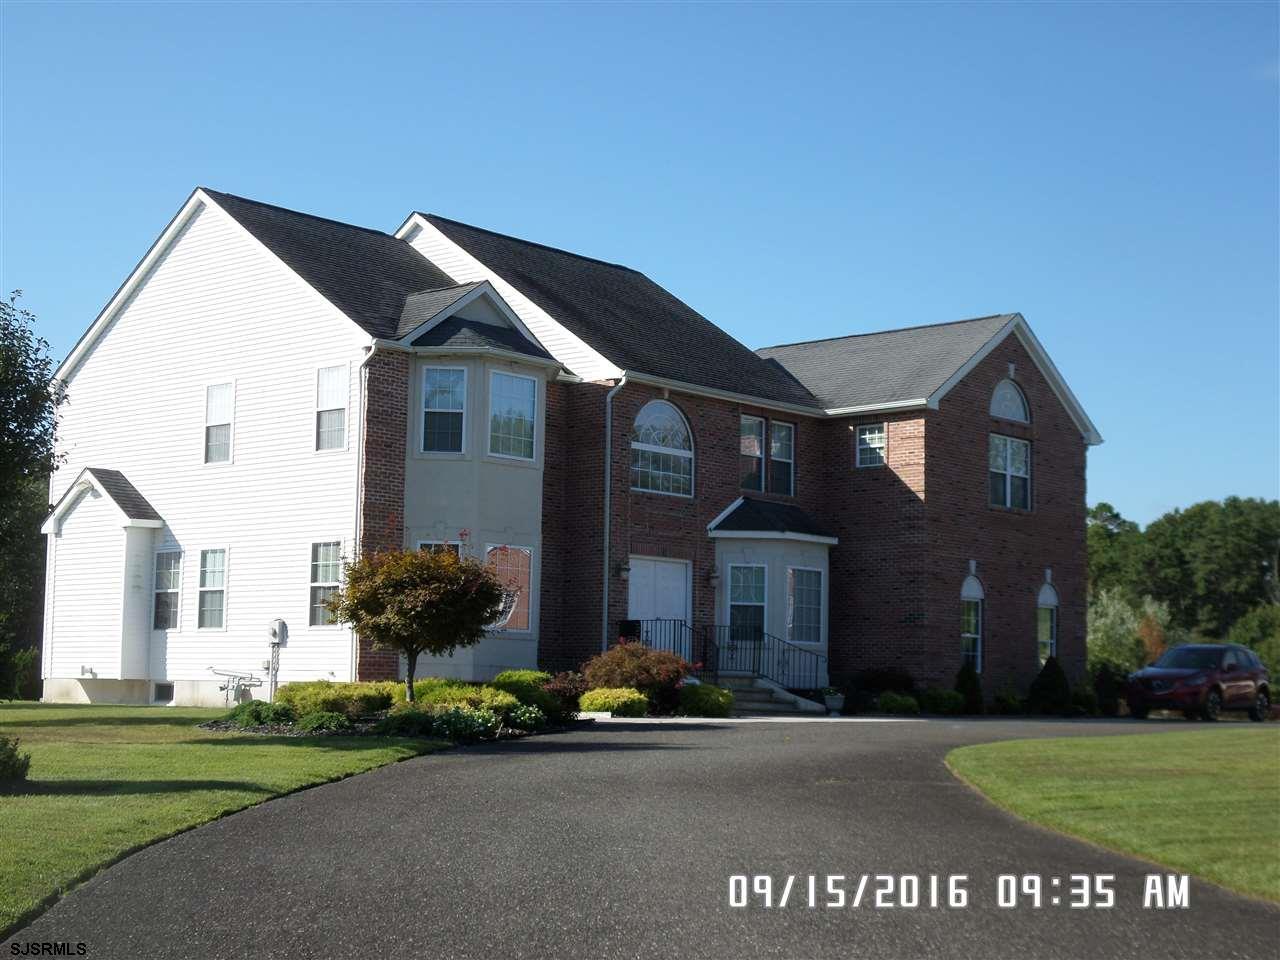 115 DAPHNE DRIVE, Galloway Township, NJ 08205